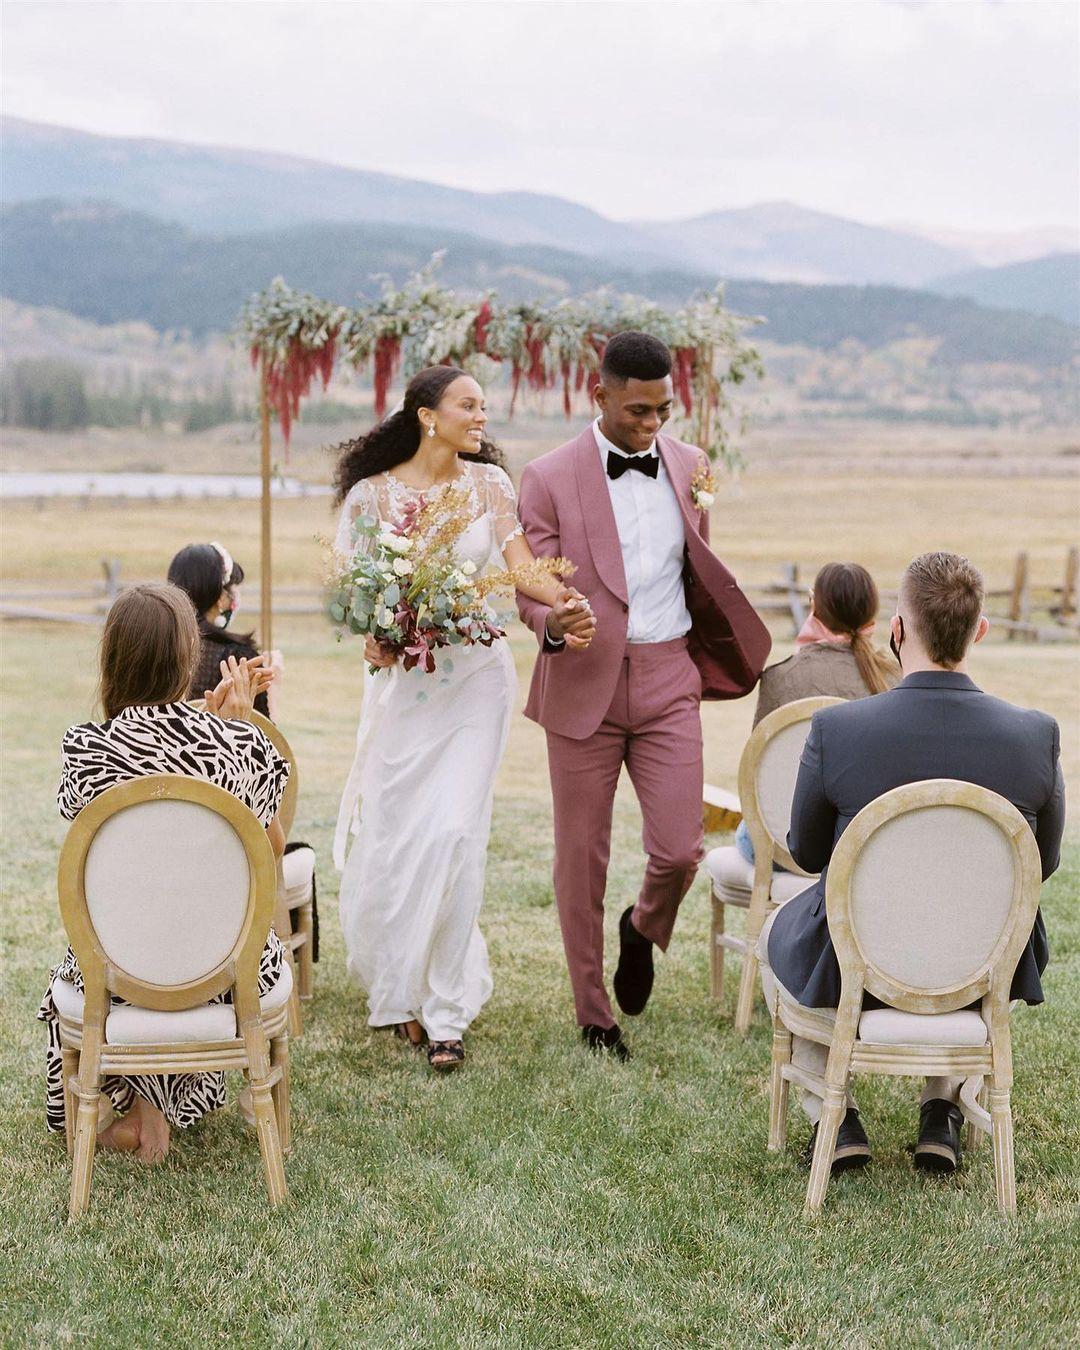 Wedding-Rehearsal-Dinner-Alternatives-Bridal-Musings Do I Have To Have A Wedding Rehearsal (& Dinner?)